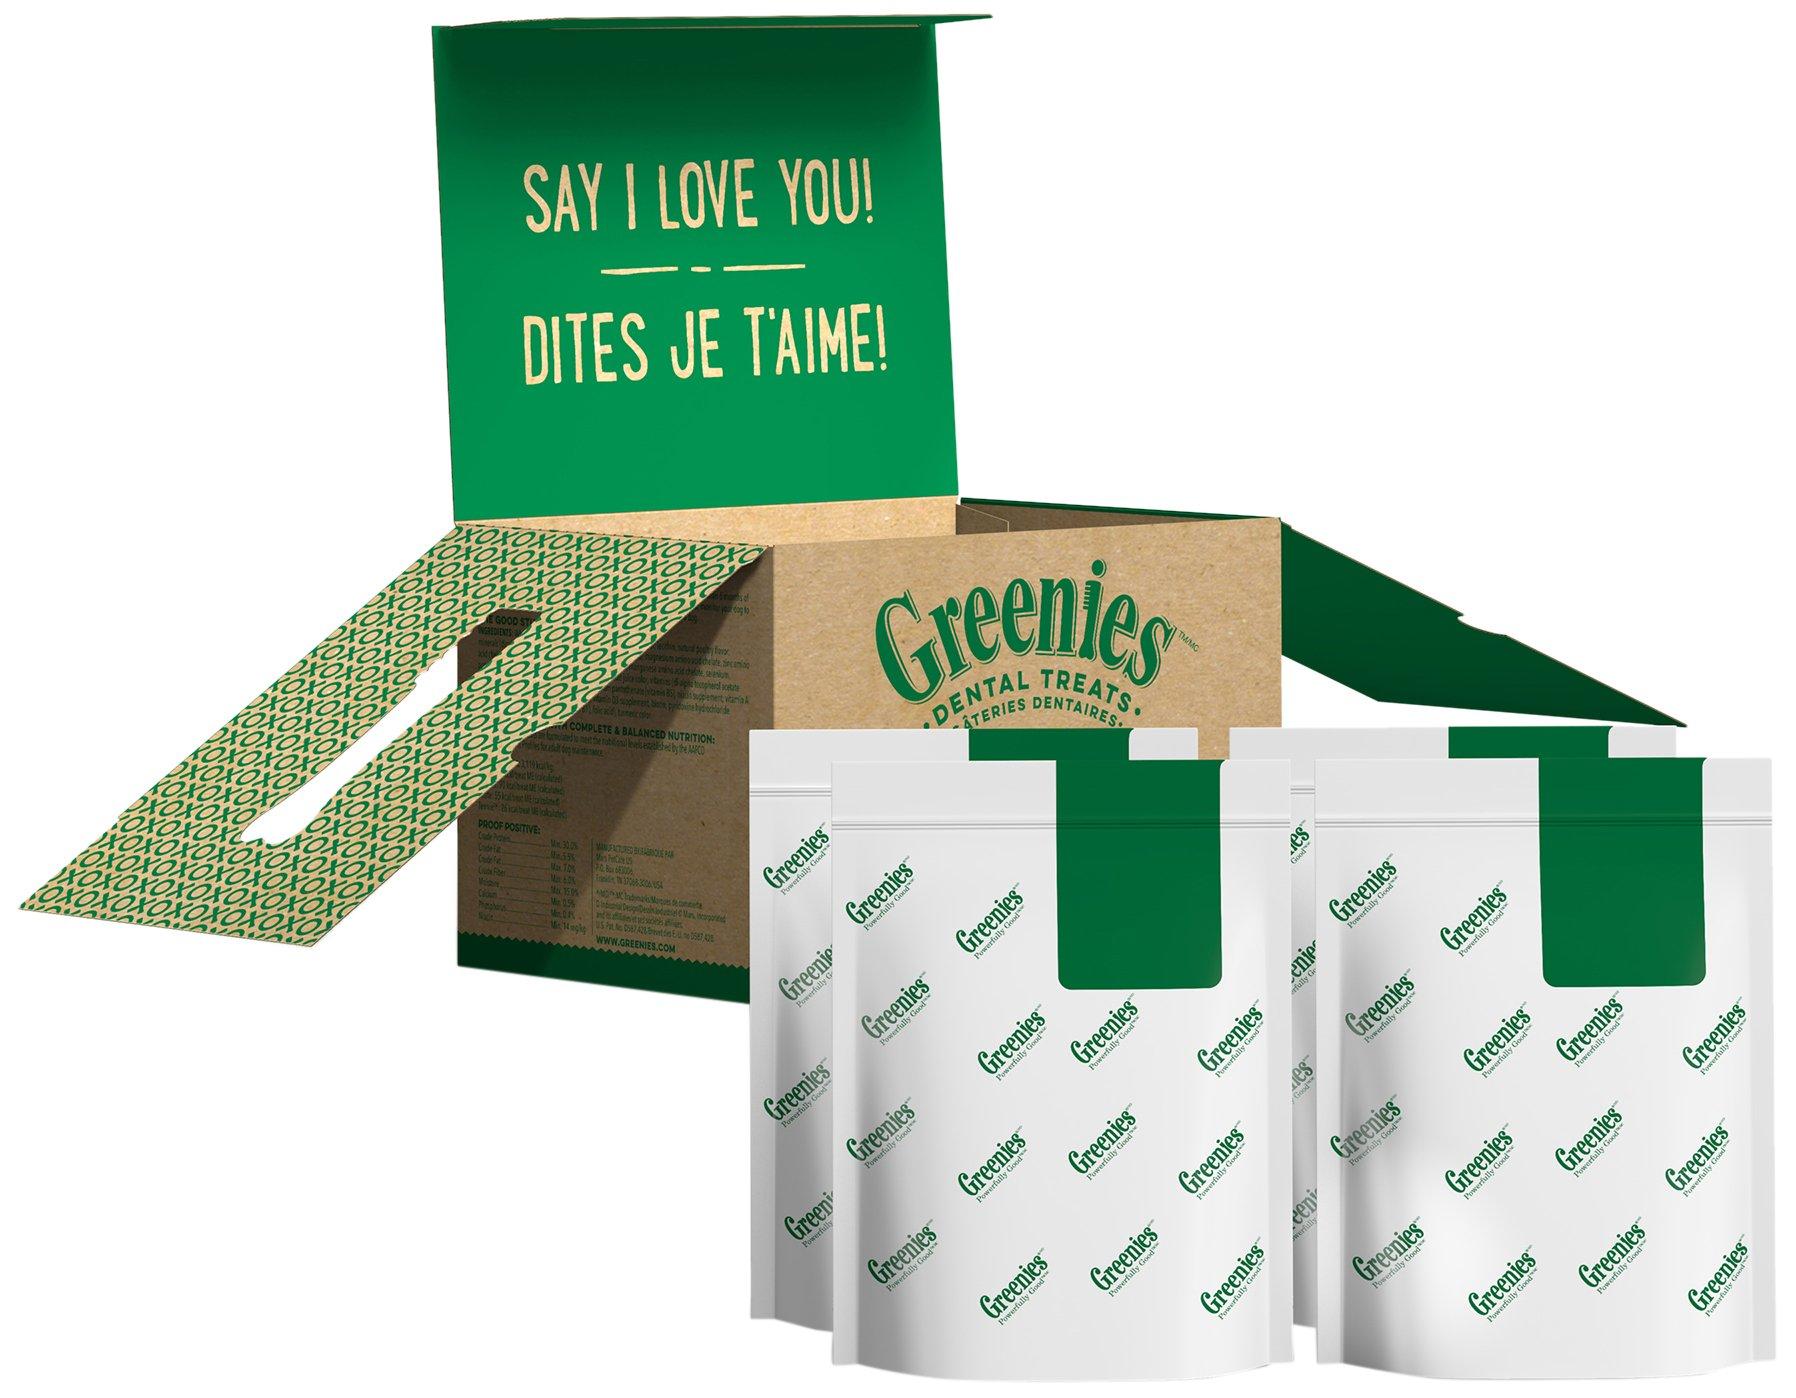 Greenies Dental Dog Treats, Large Size, Original Flavor (72 Ounces 48 Treats)  Greenies Dog Dental Chews: For Clean Teeth and Healthy Gums